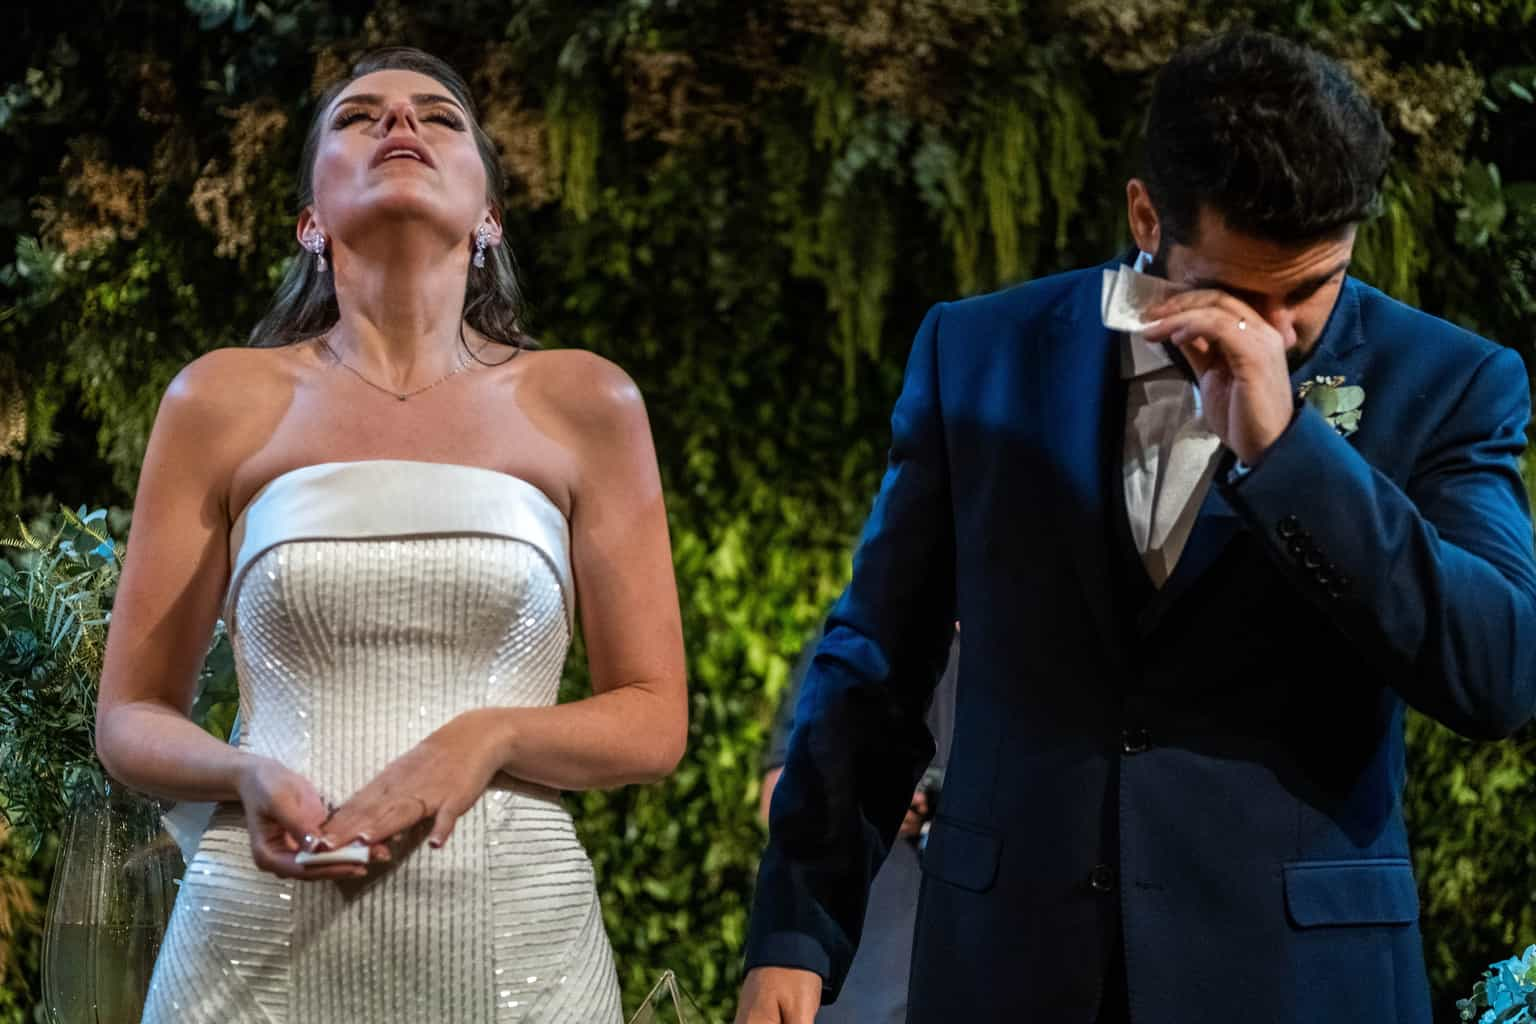 Bel-Benkler-eventos-Casamento-Ariane-e-Matheus-cerimonia-decoracao-contemporanea-fotografia-Rafael-Bigarelli-noivos-na-pista-Spazio-Giardini-63